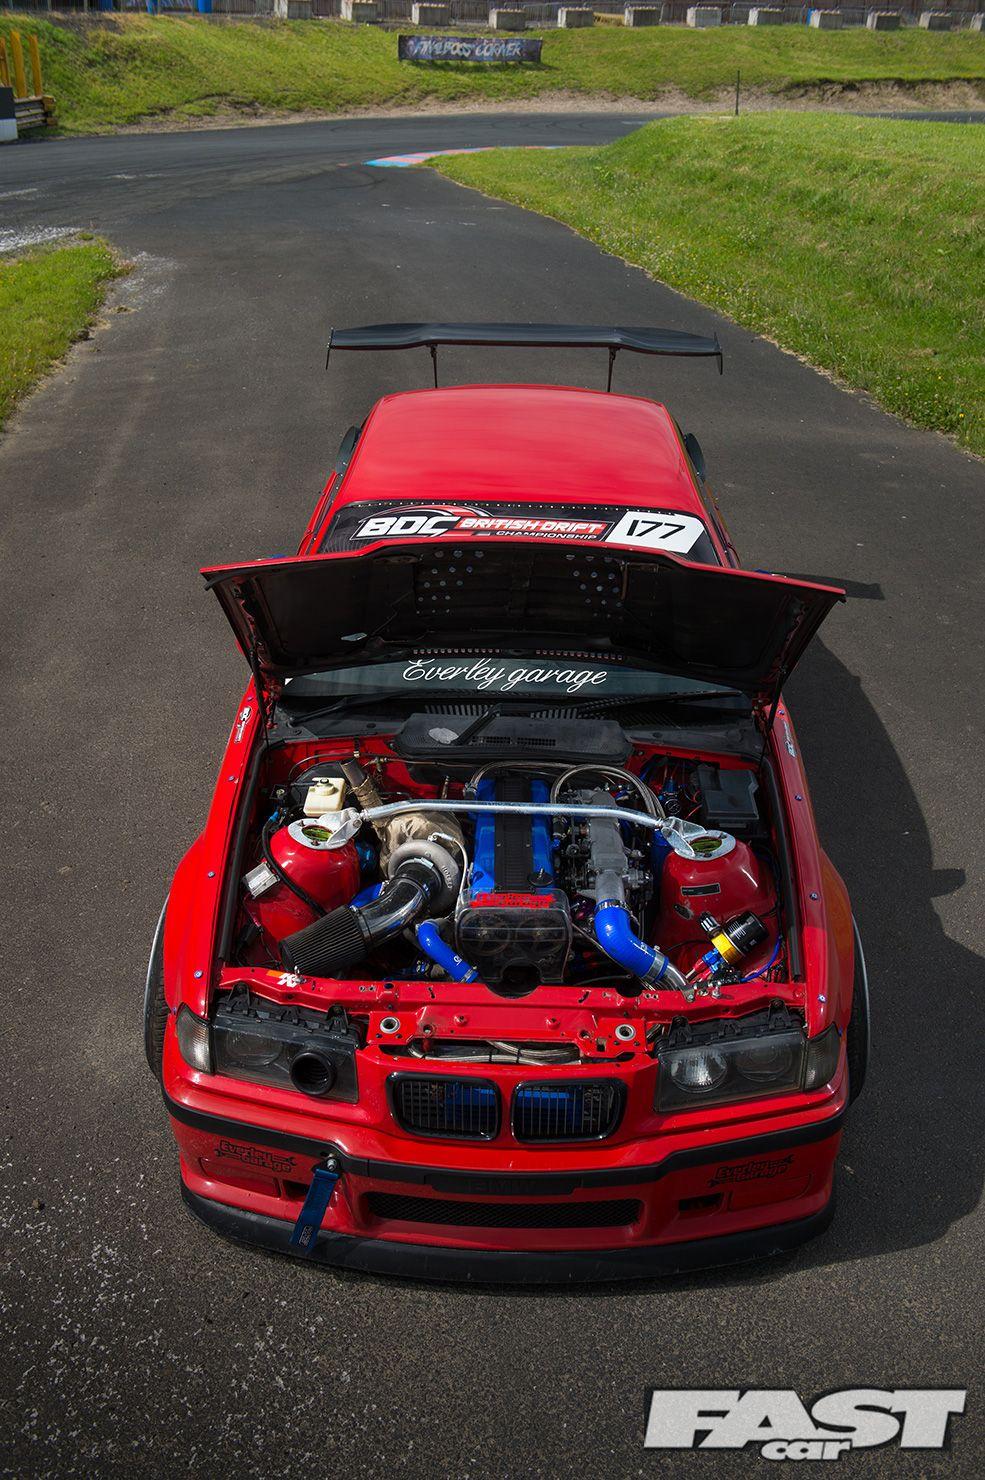 medium resolution of bmw e36 toyota jz bdc drift car